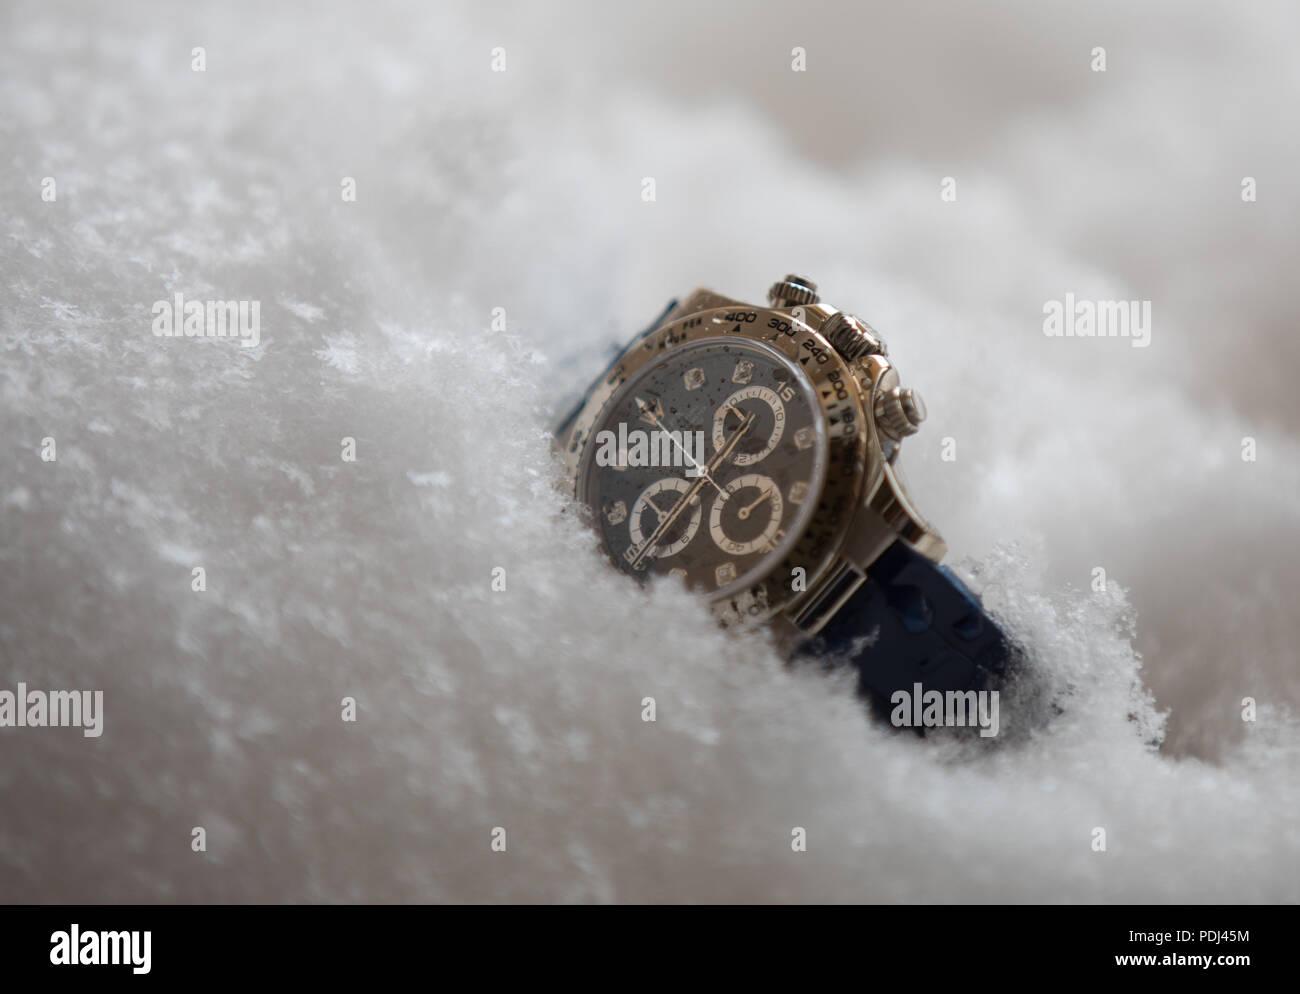 Rolex Daytona 116519 - Stock Image